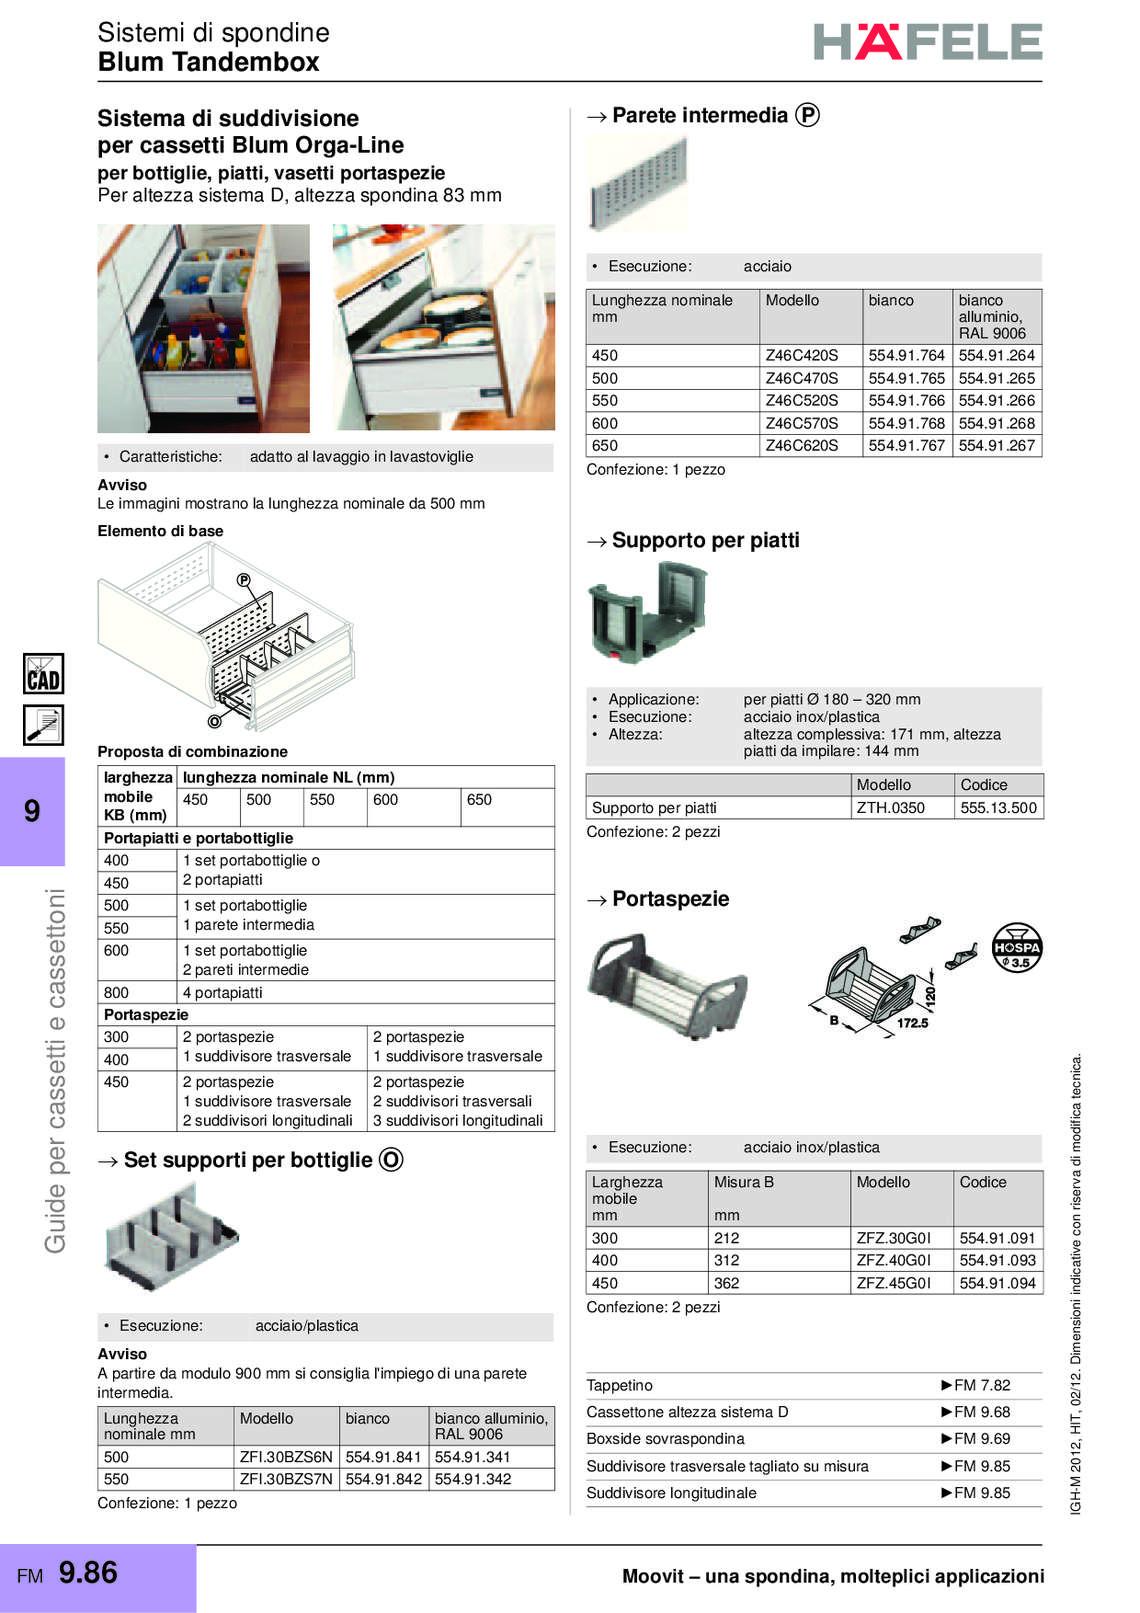 hafele-spondine-e-guide-per-mobili_40_109.jpg